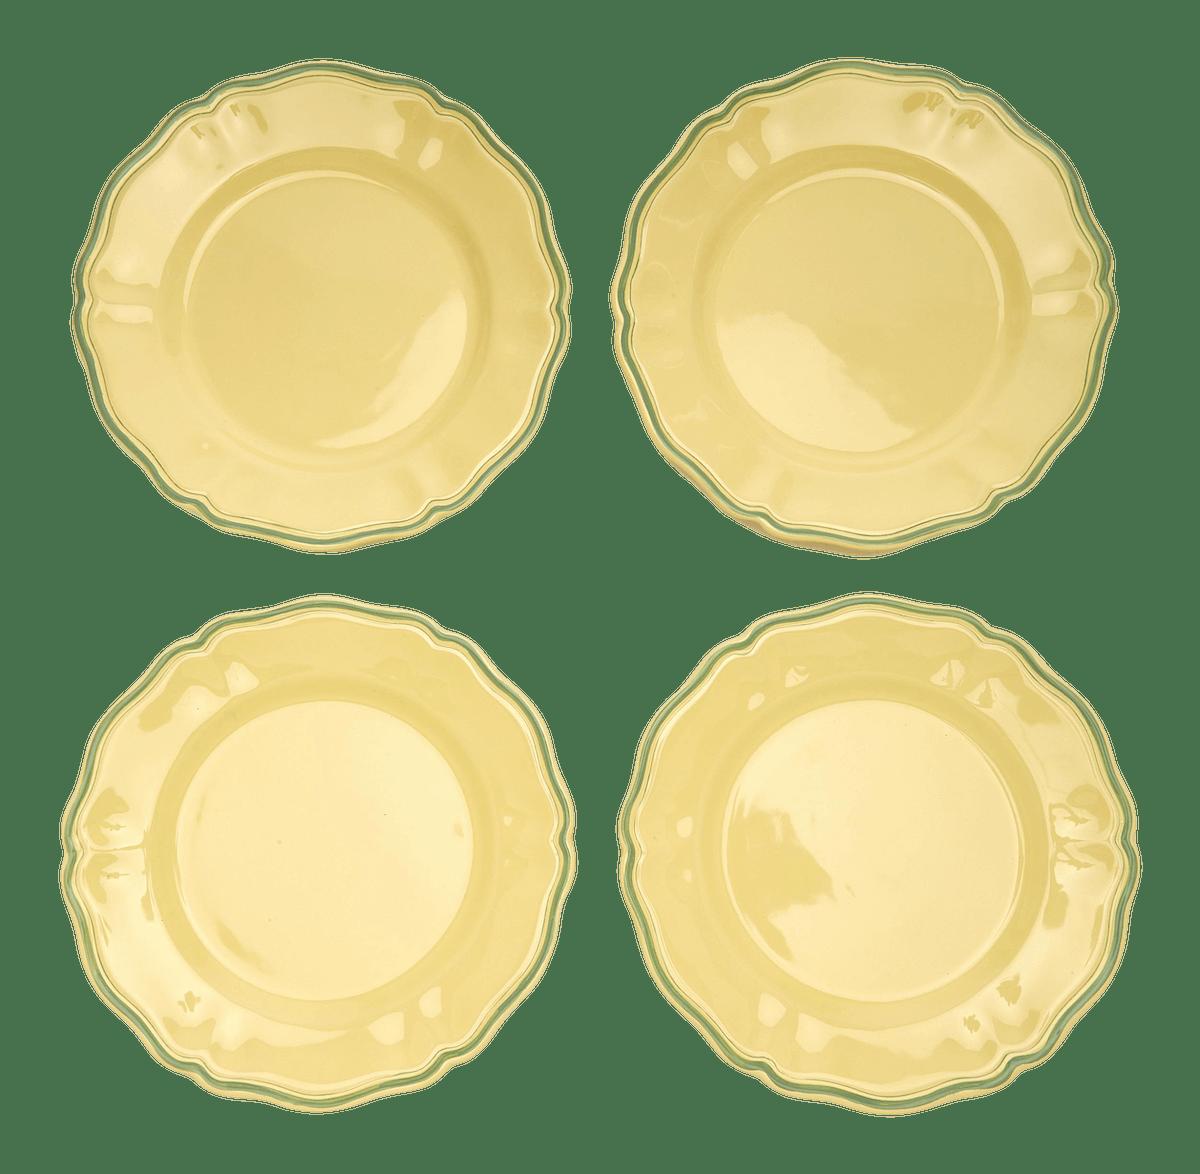 Moda Domus x Chairish Exclusive Colorblock Dinner Plates - Set of 4